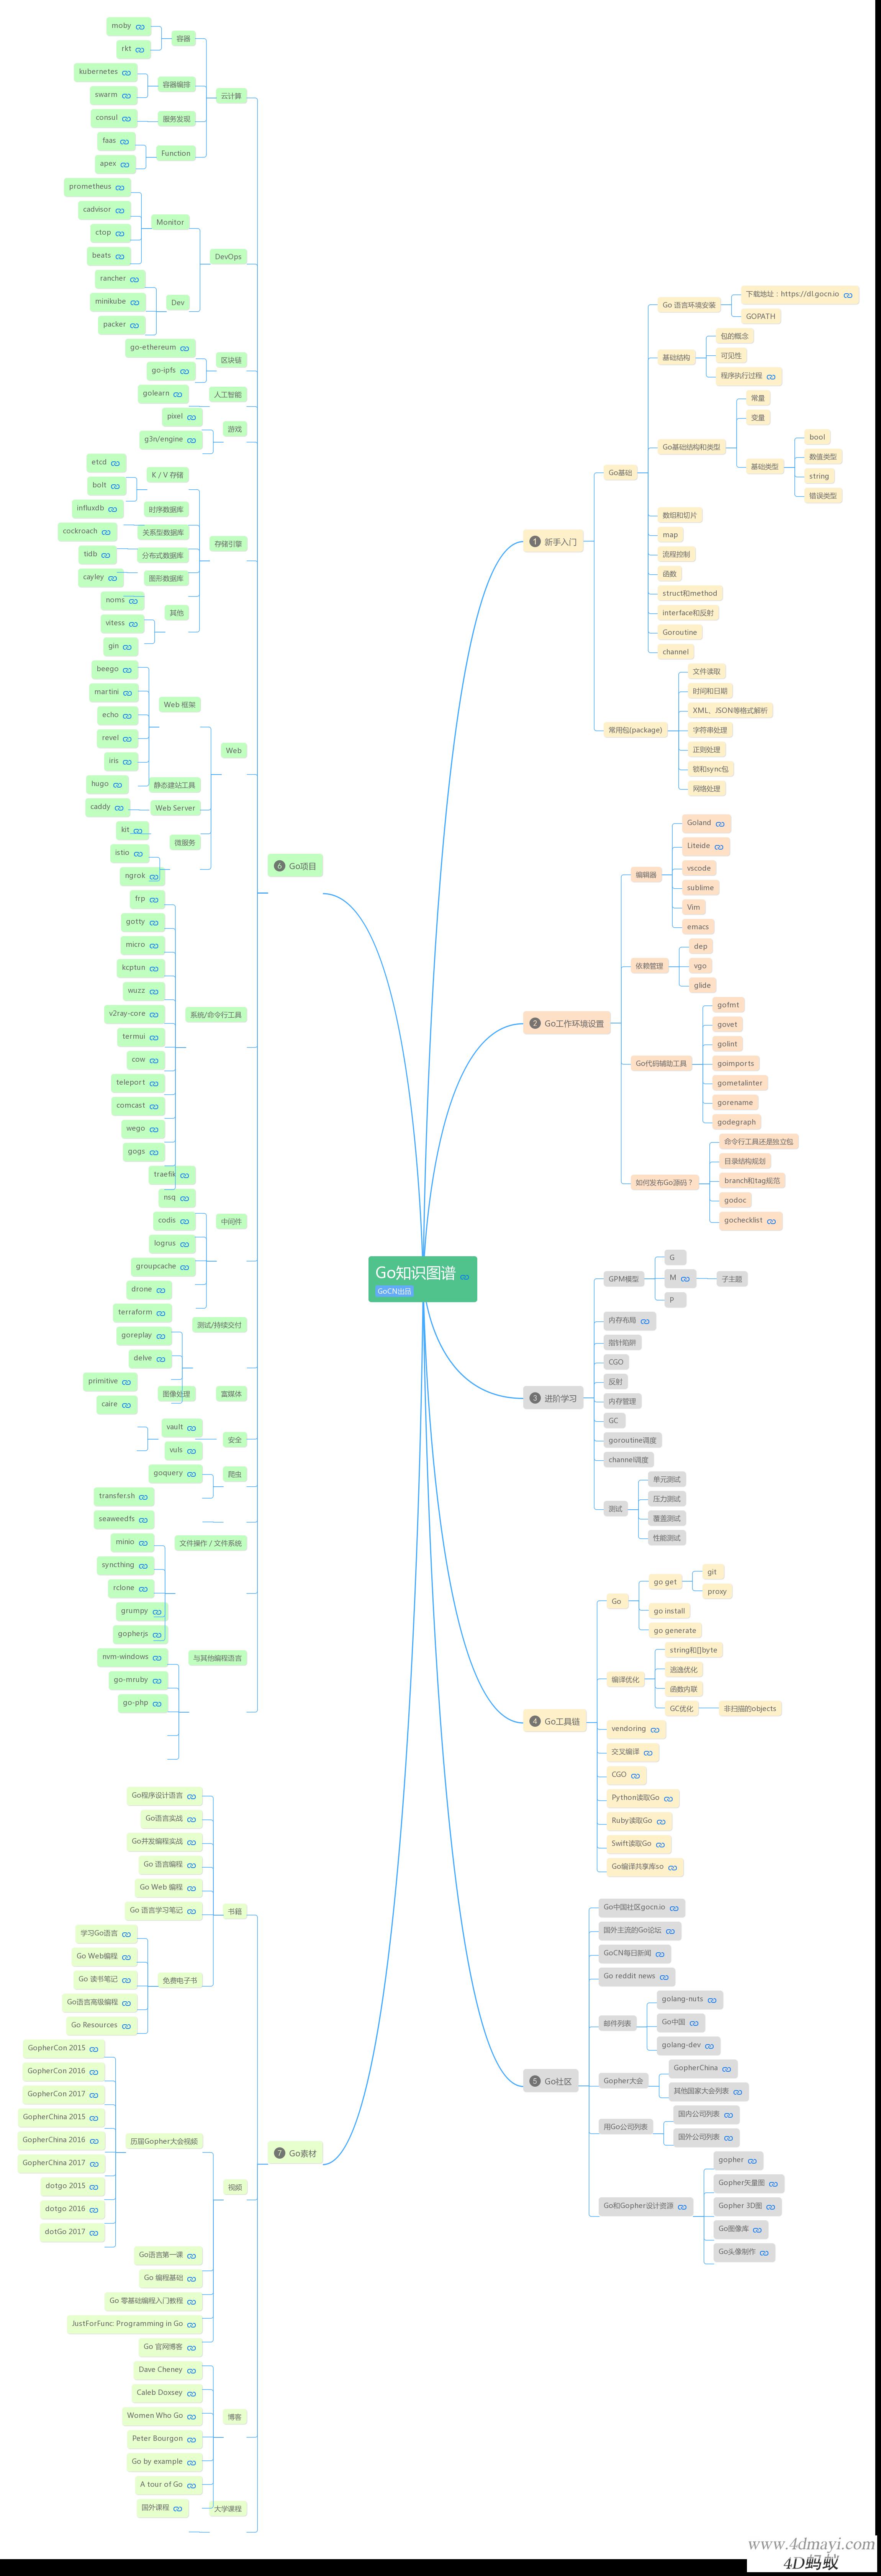 Go语言学习路线